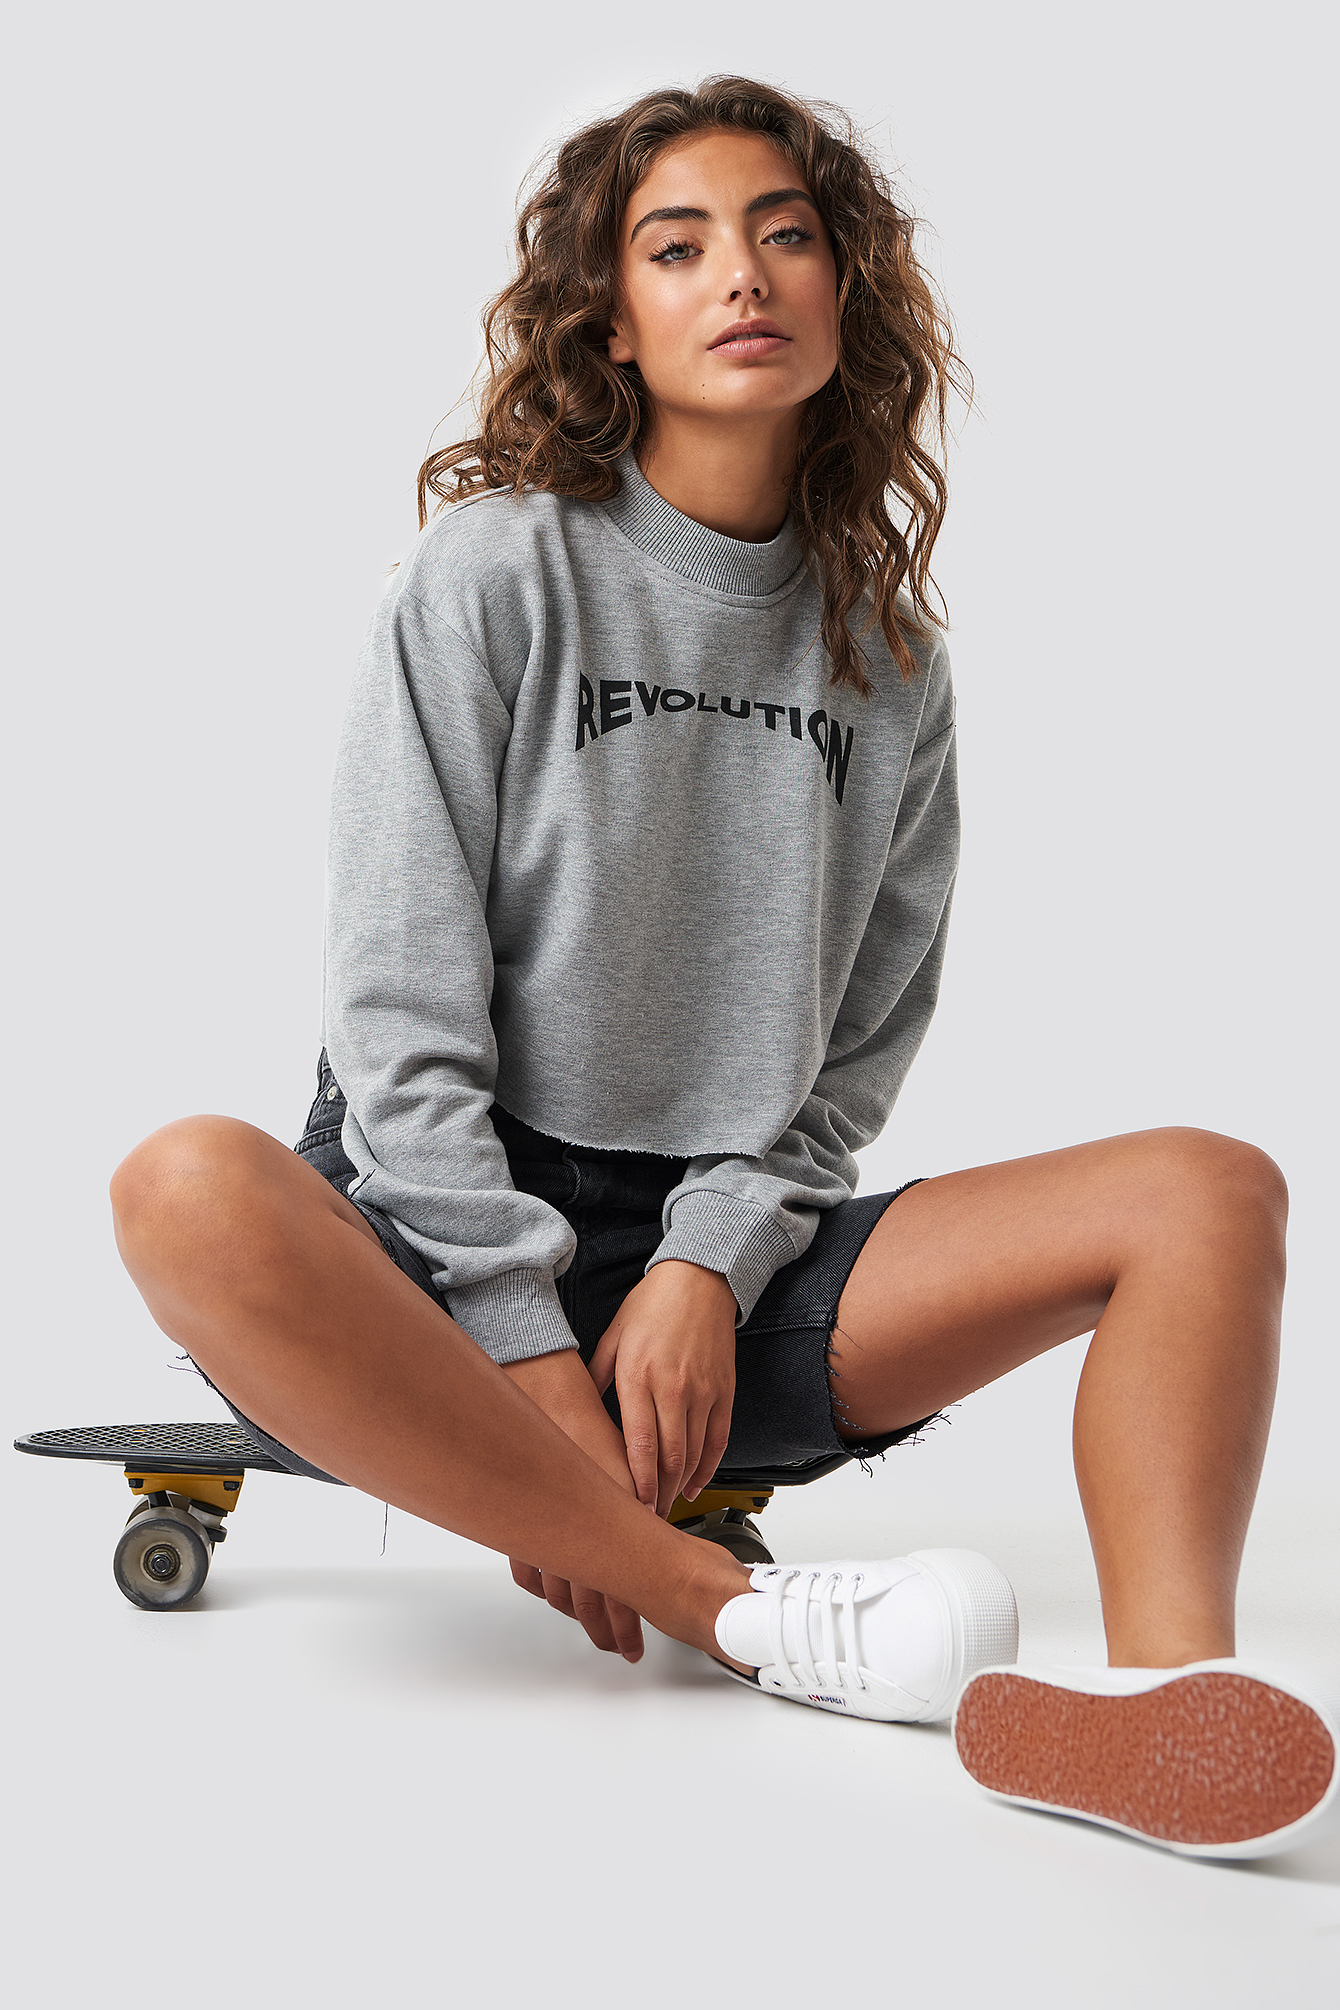 ASTRIDOLSENXNAKD Revolution Cropped Sweater - Grey